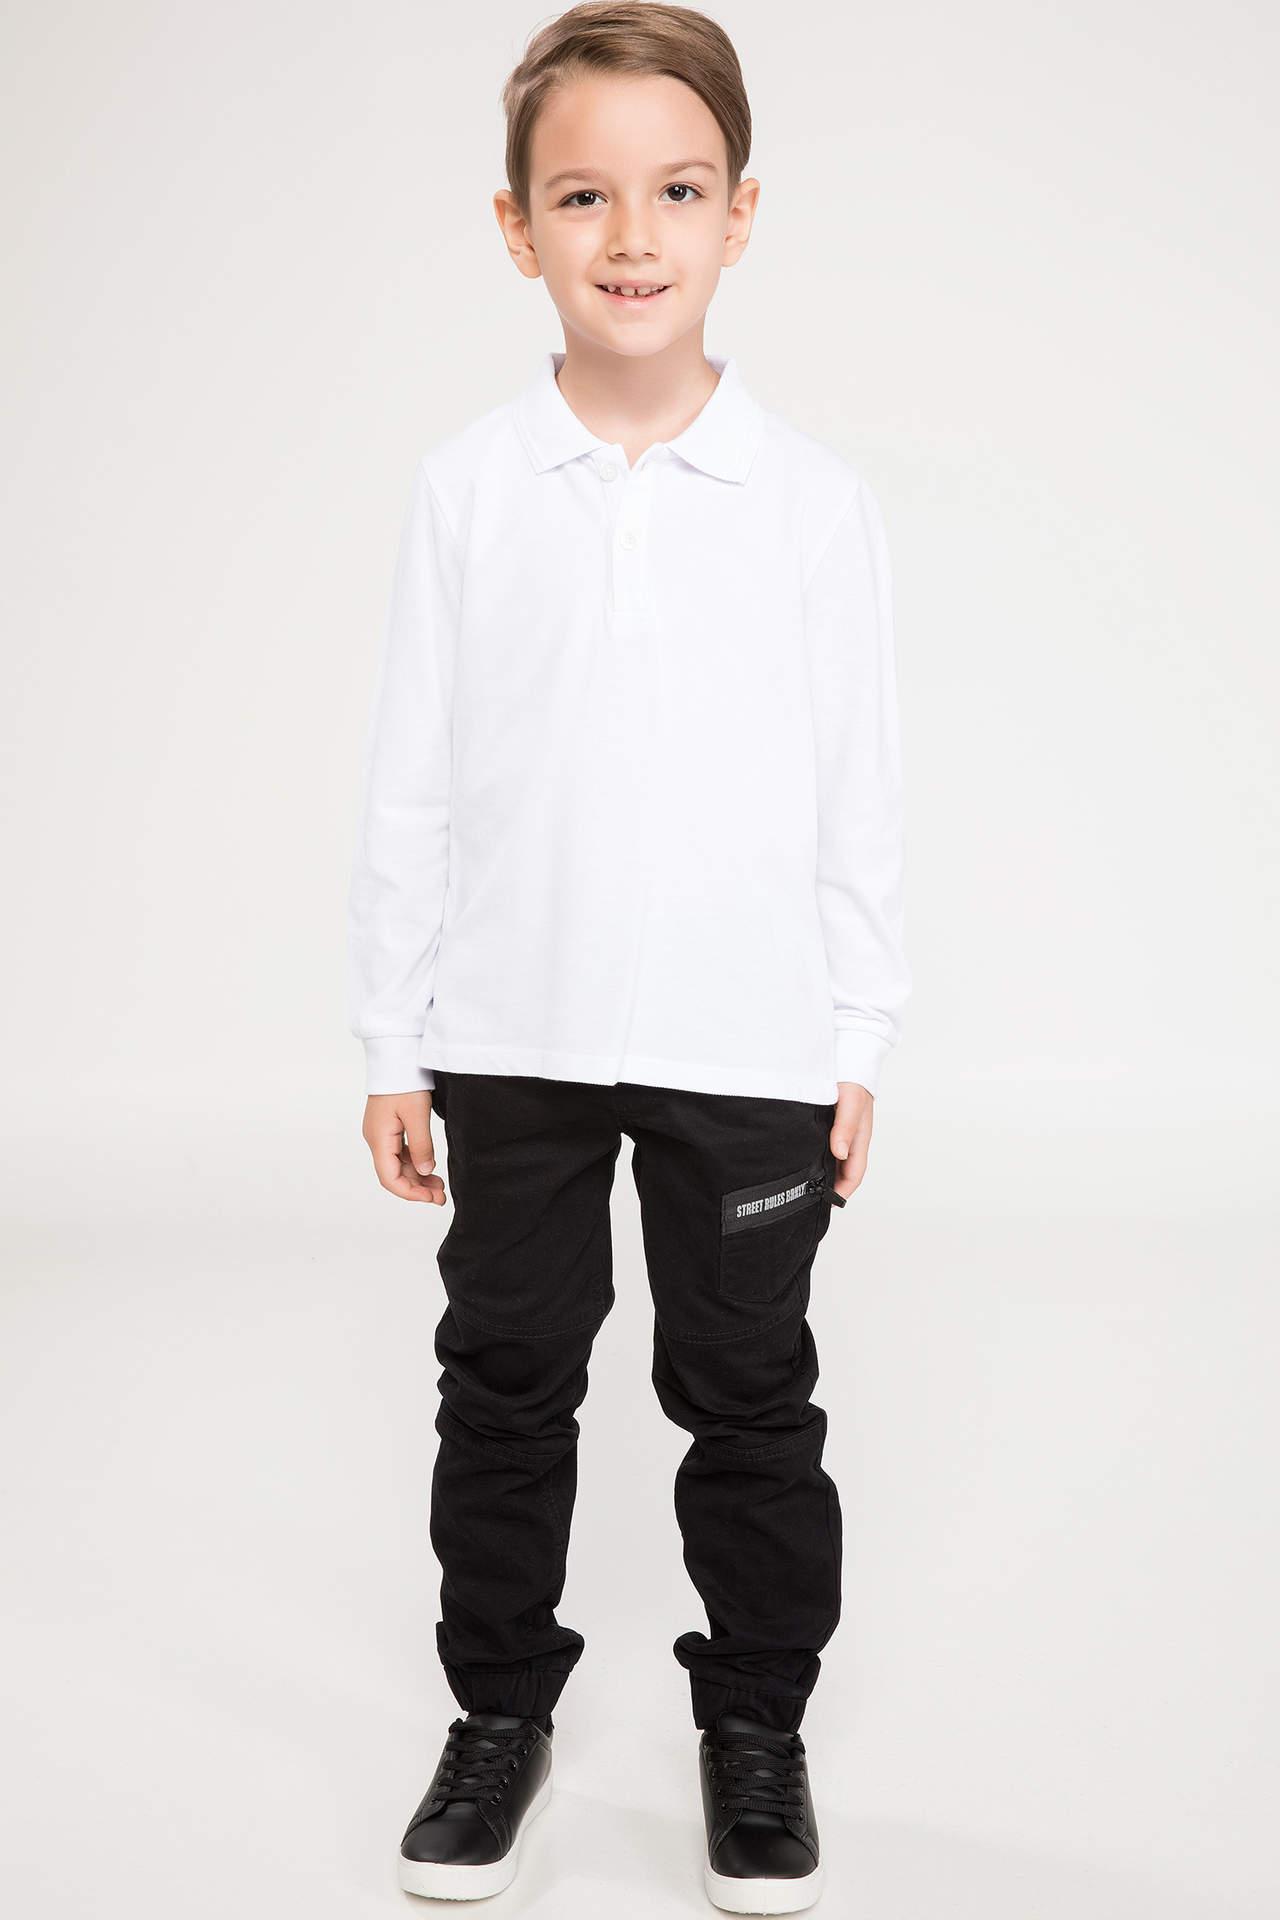 DeFacto Erkek Çocuk Jogger Pantolon Siyah male